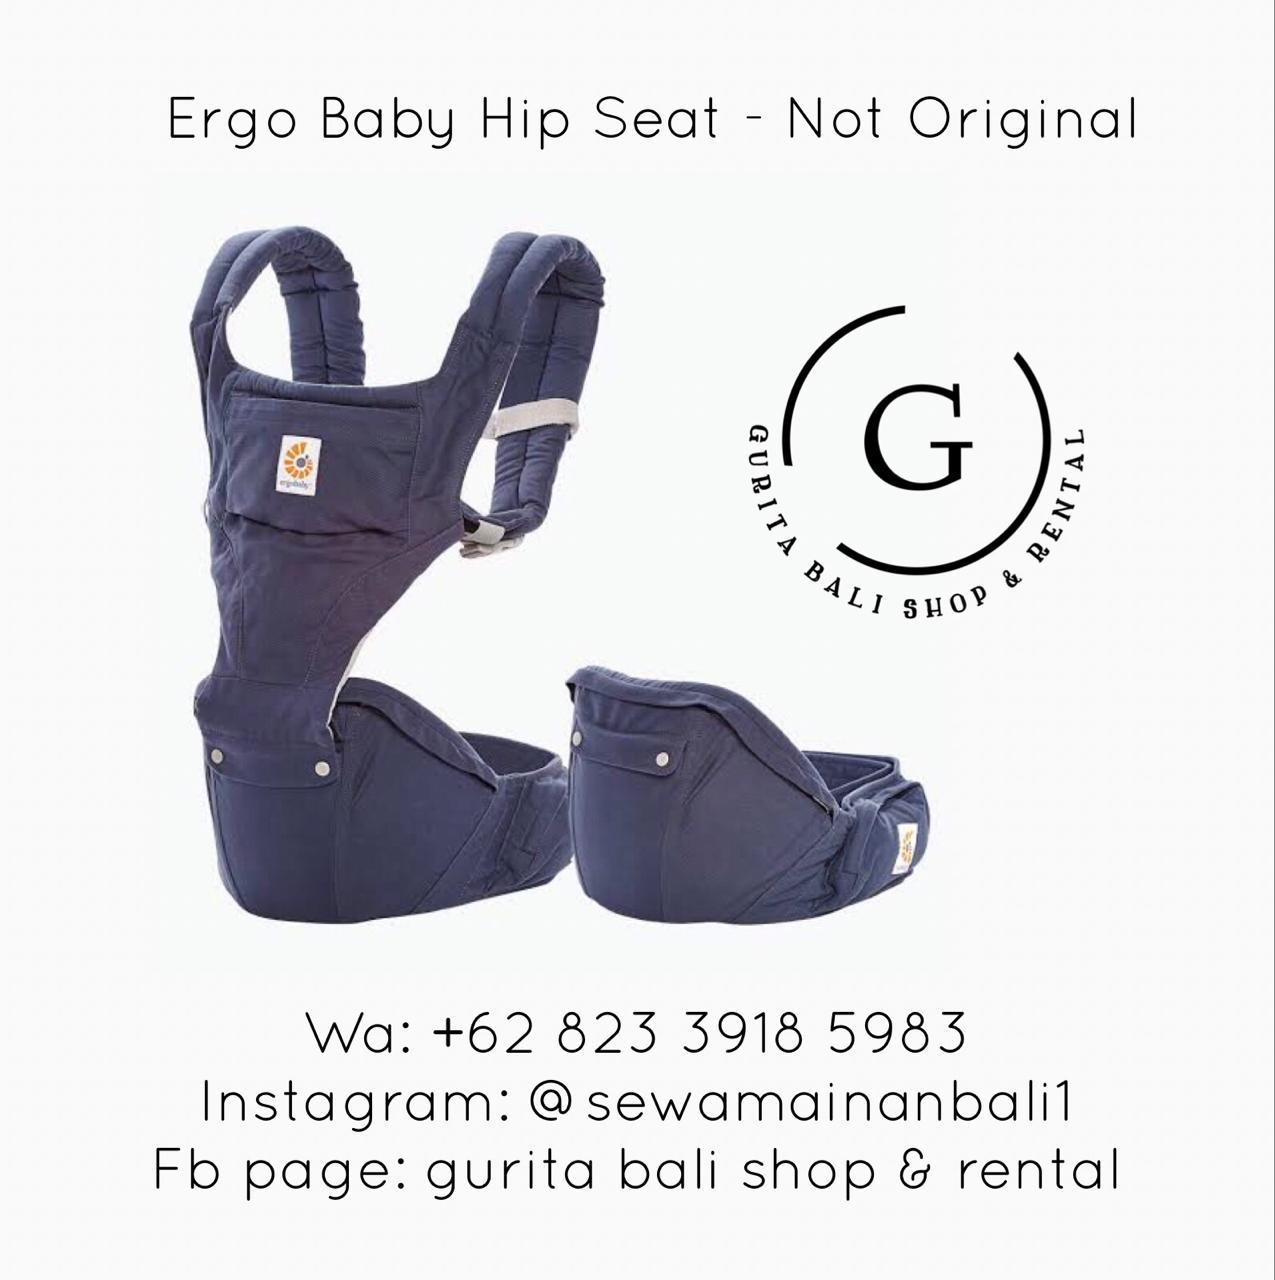 ERGO BABY HIPSEAT - NOT ORI